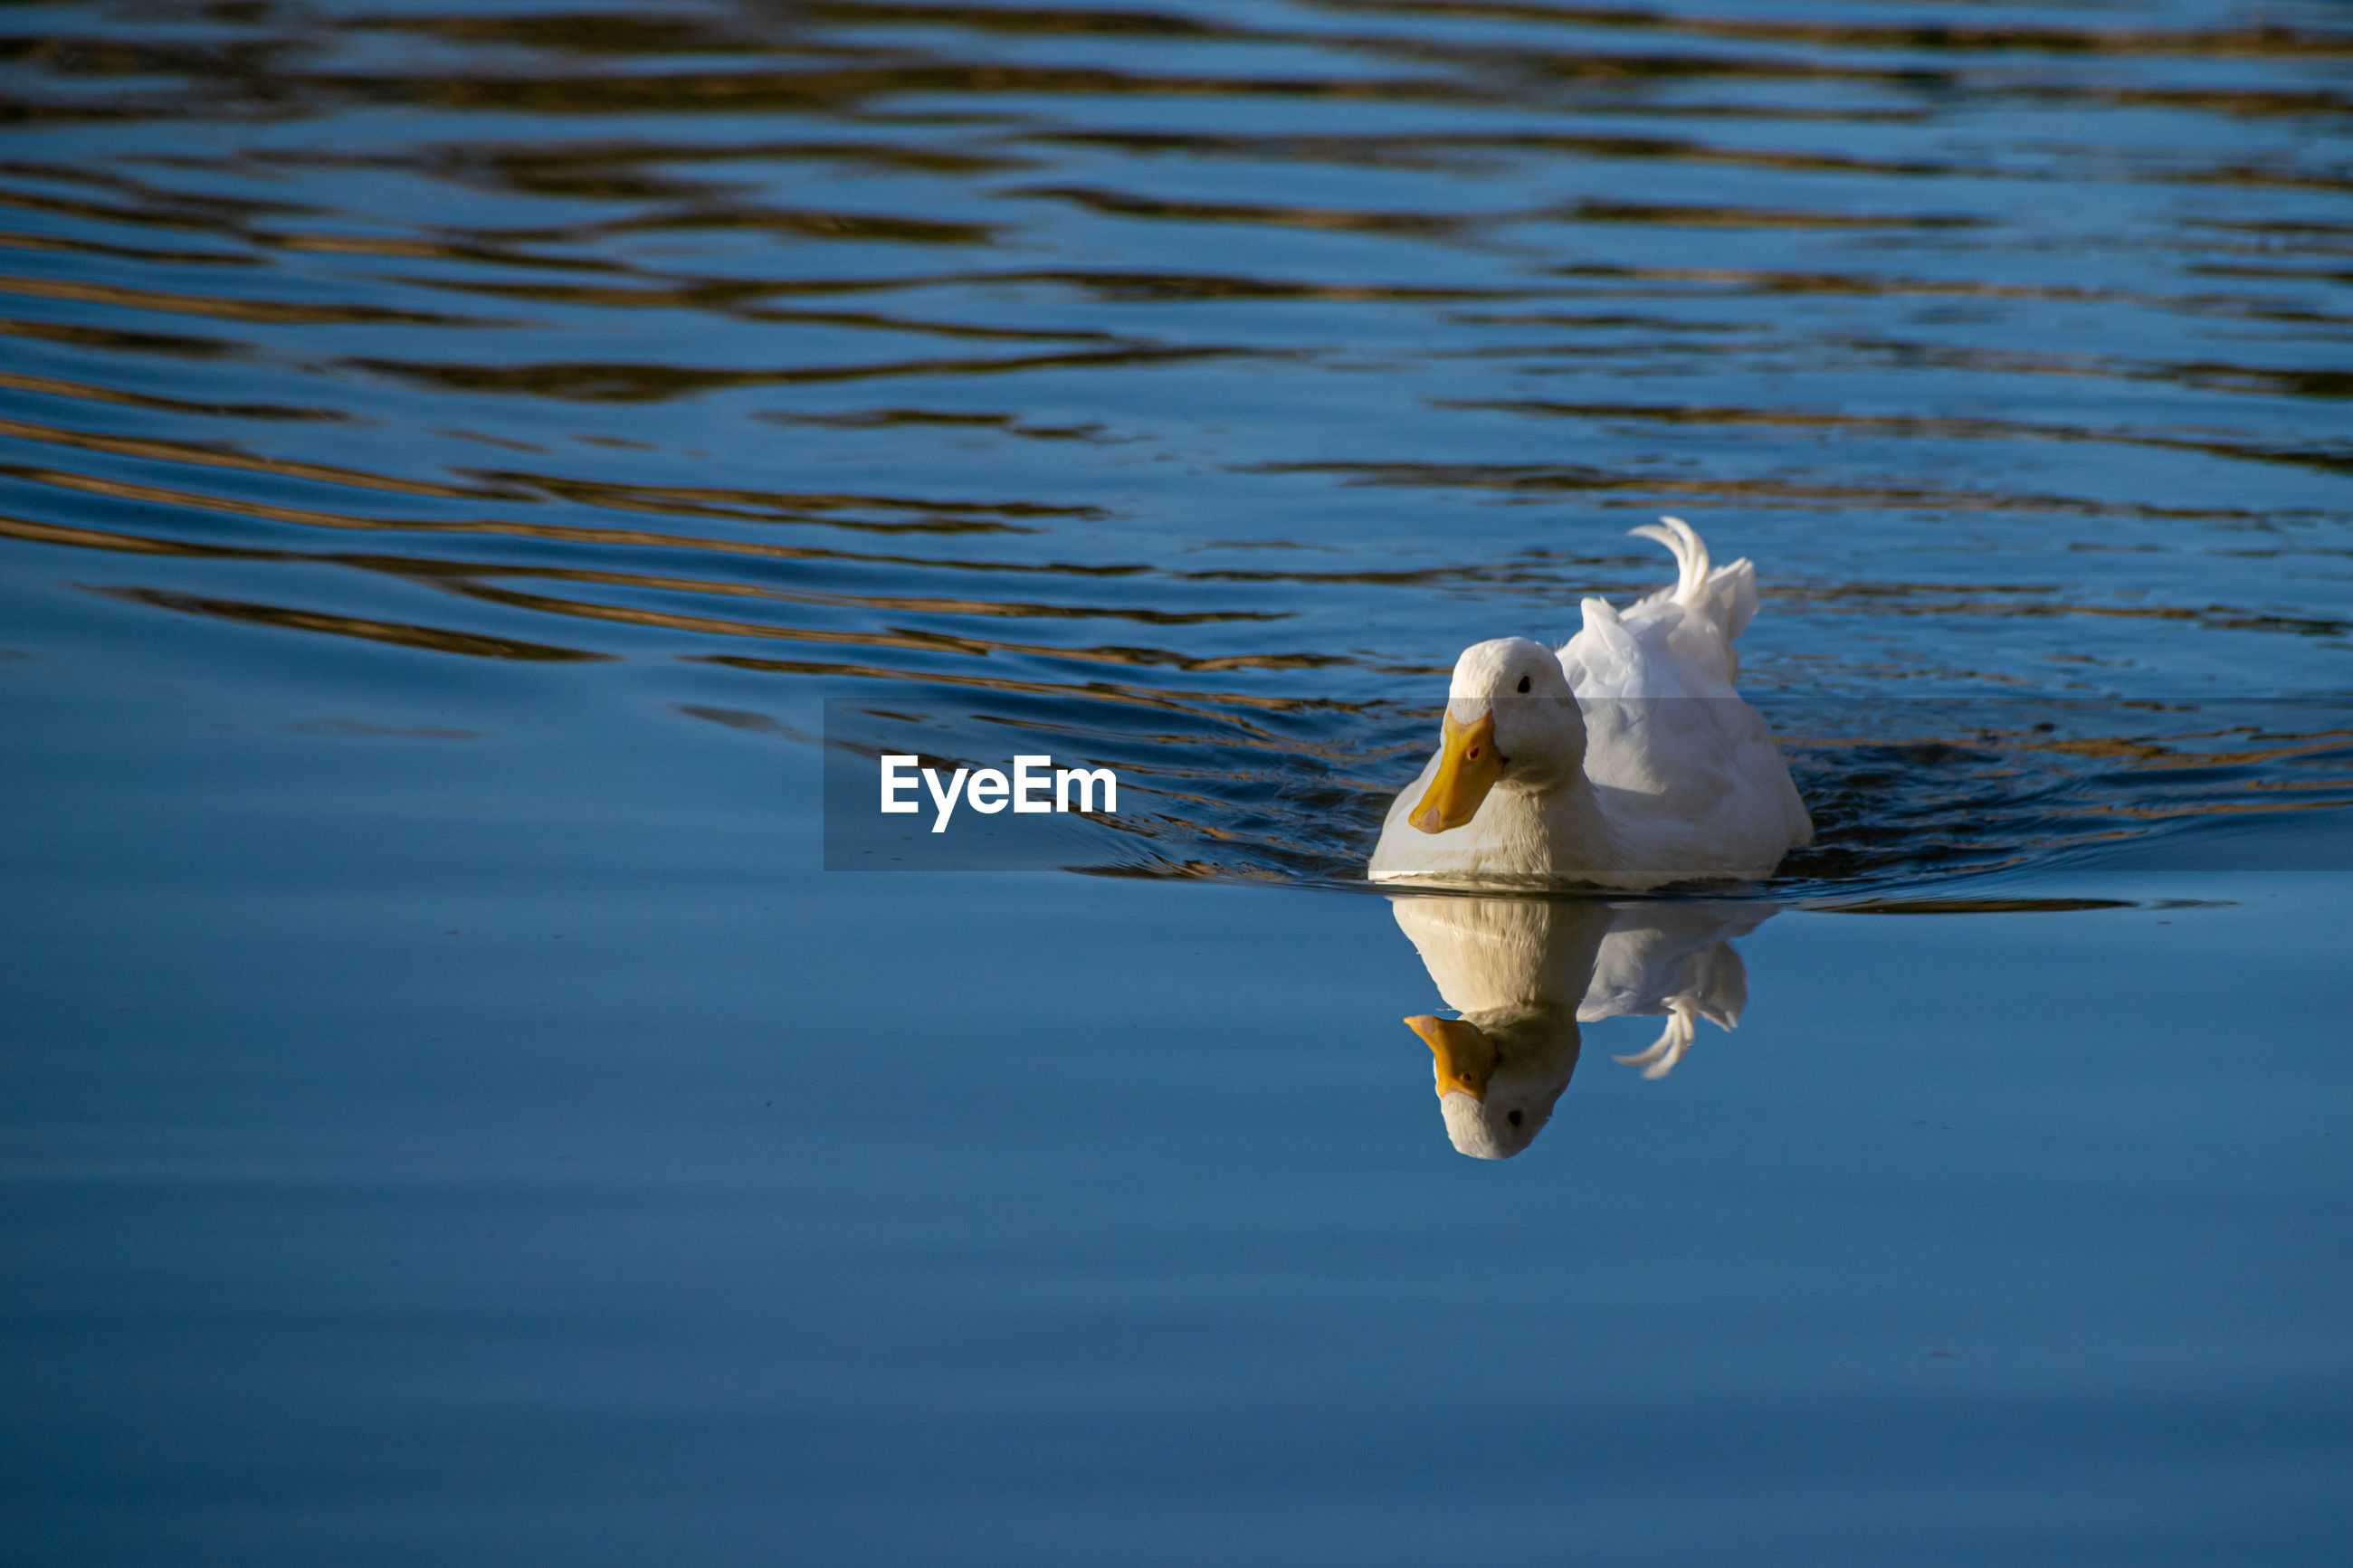 White pekin ducks swimming on a still calm lake with water reflection